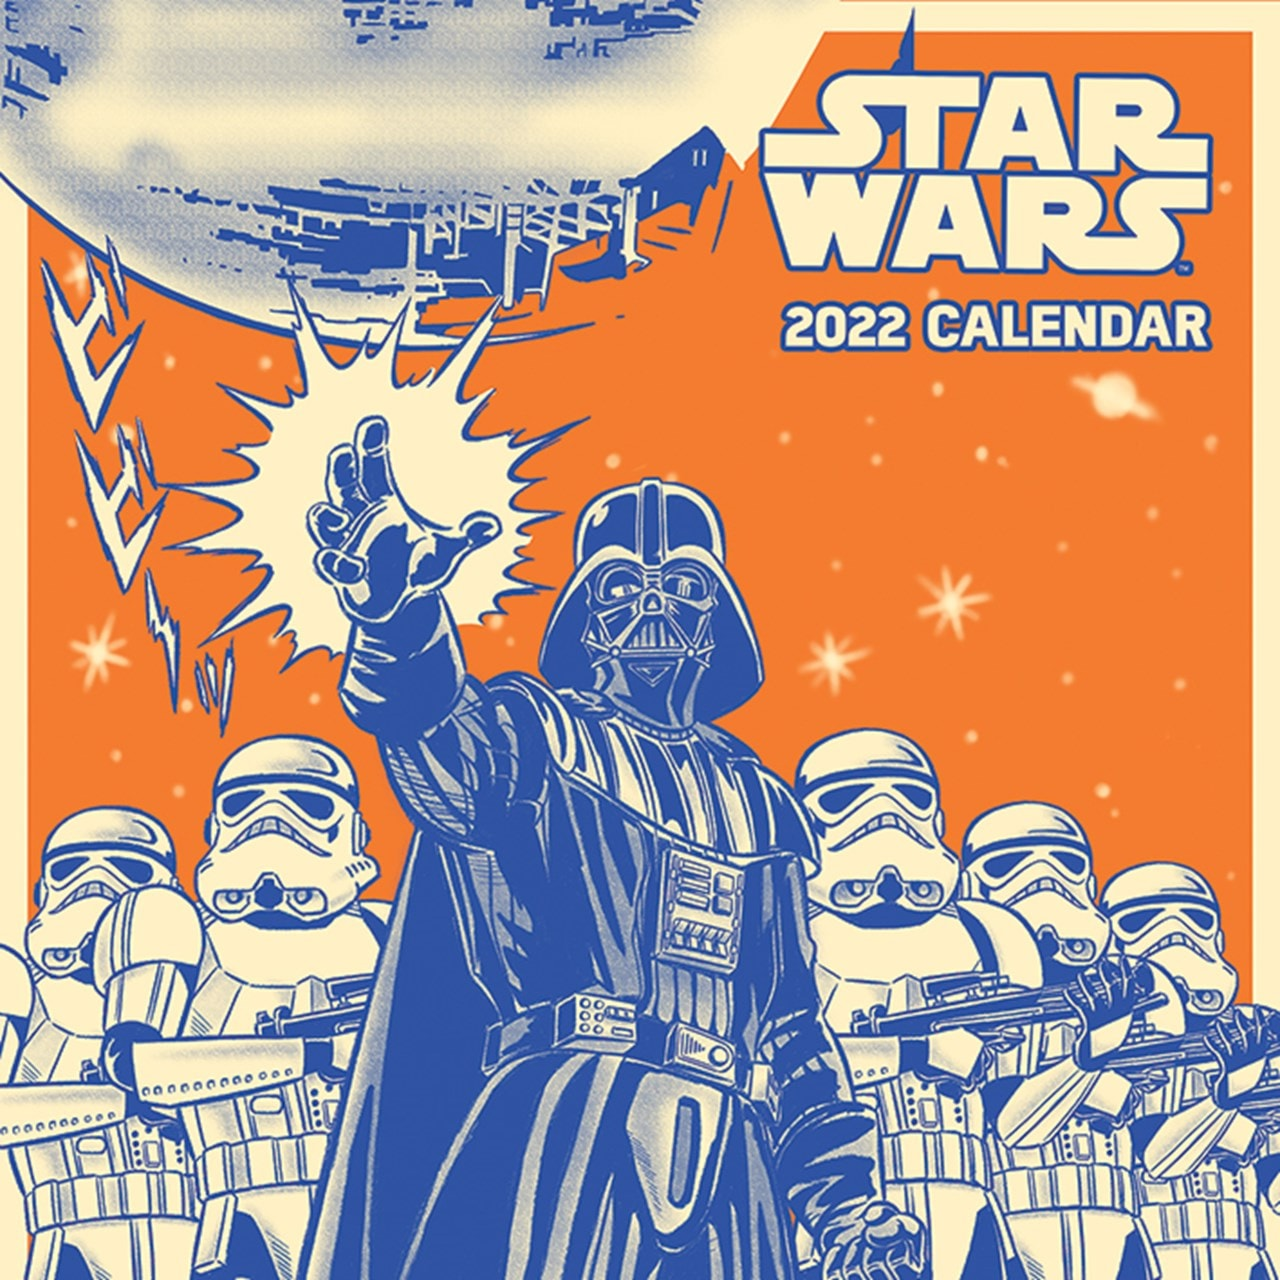 Star Wars Calendar 2022.Star Wars 3d Cover Classic Square 2022 Calendar Calendars Free Shipping Over 20 Hmv Store